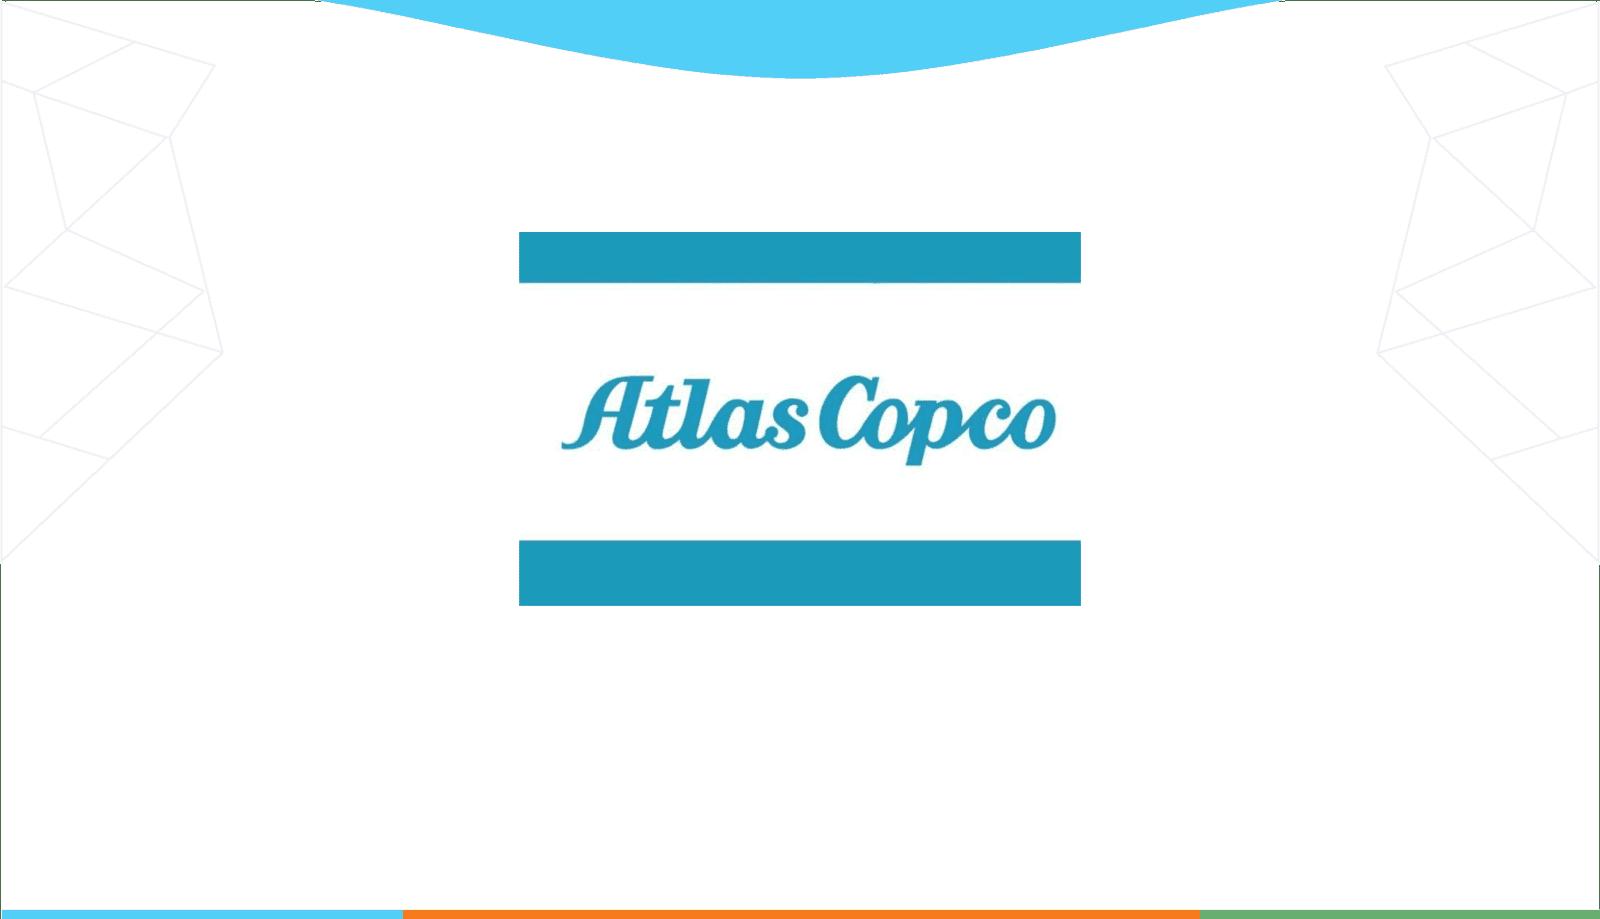 Atlas Copco Careers | Senior Accountant وظائف أطلس كوبكو